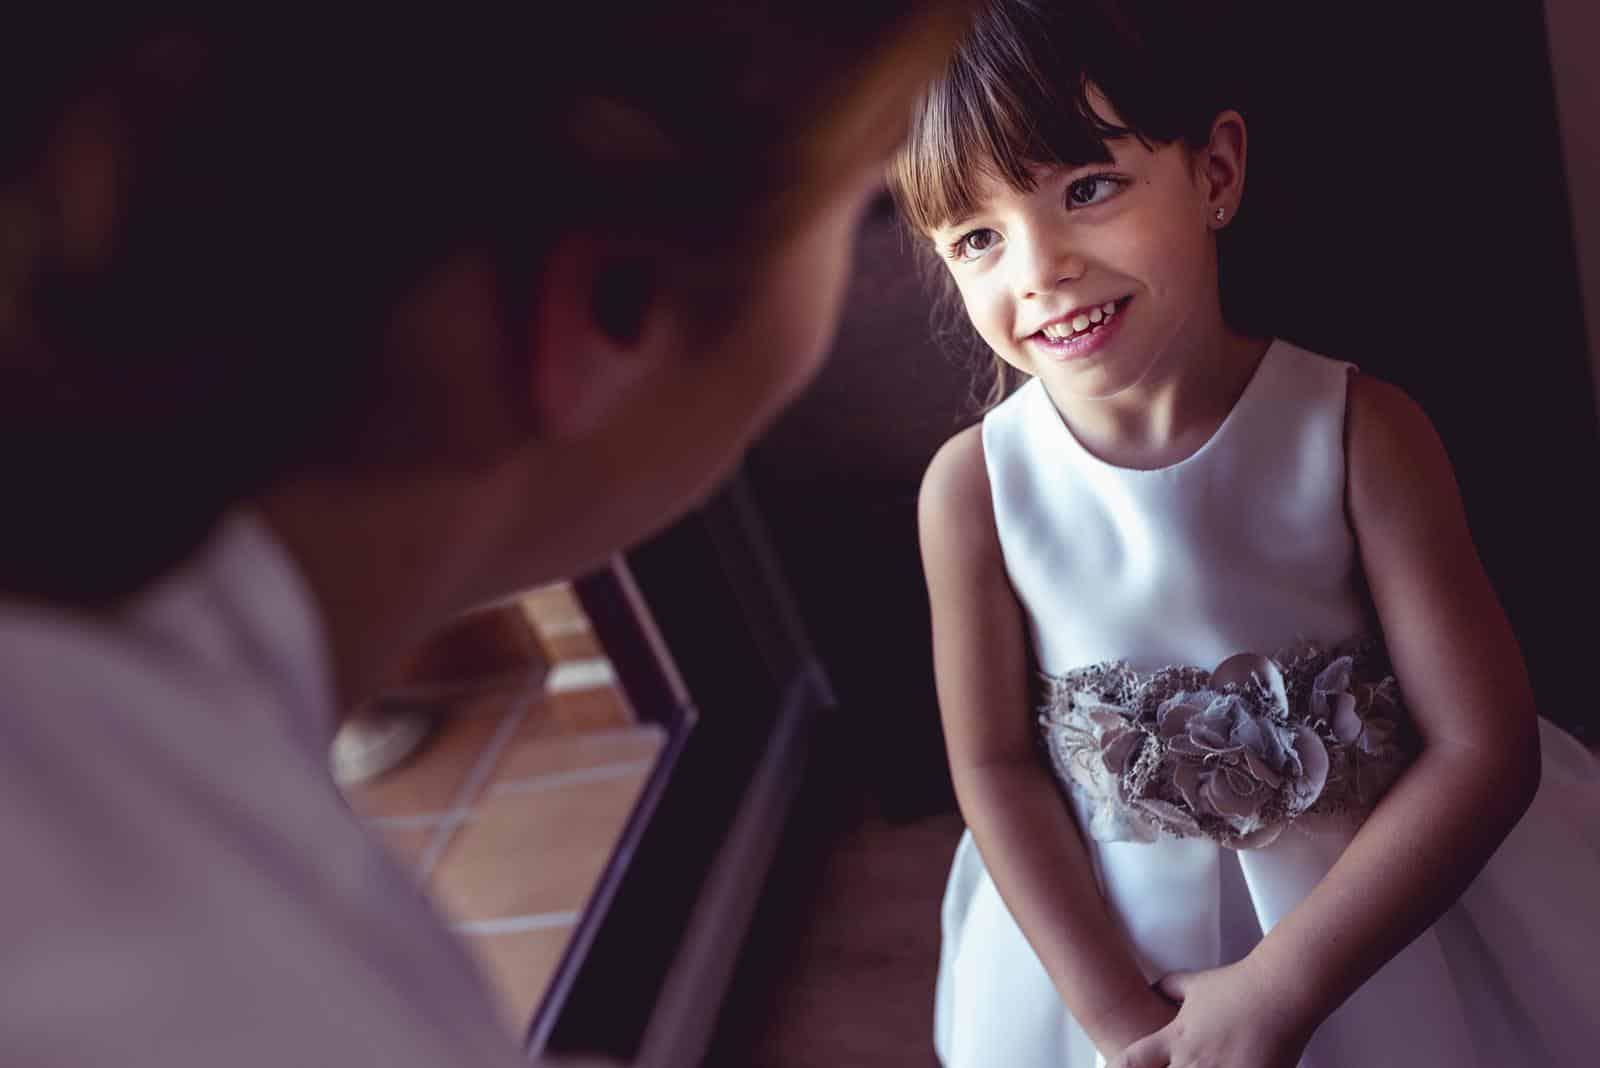 mirada de la niña